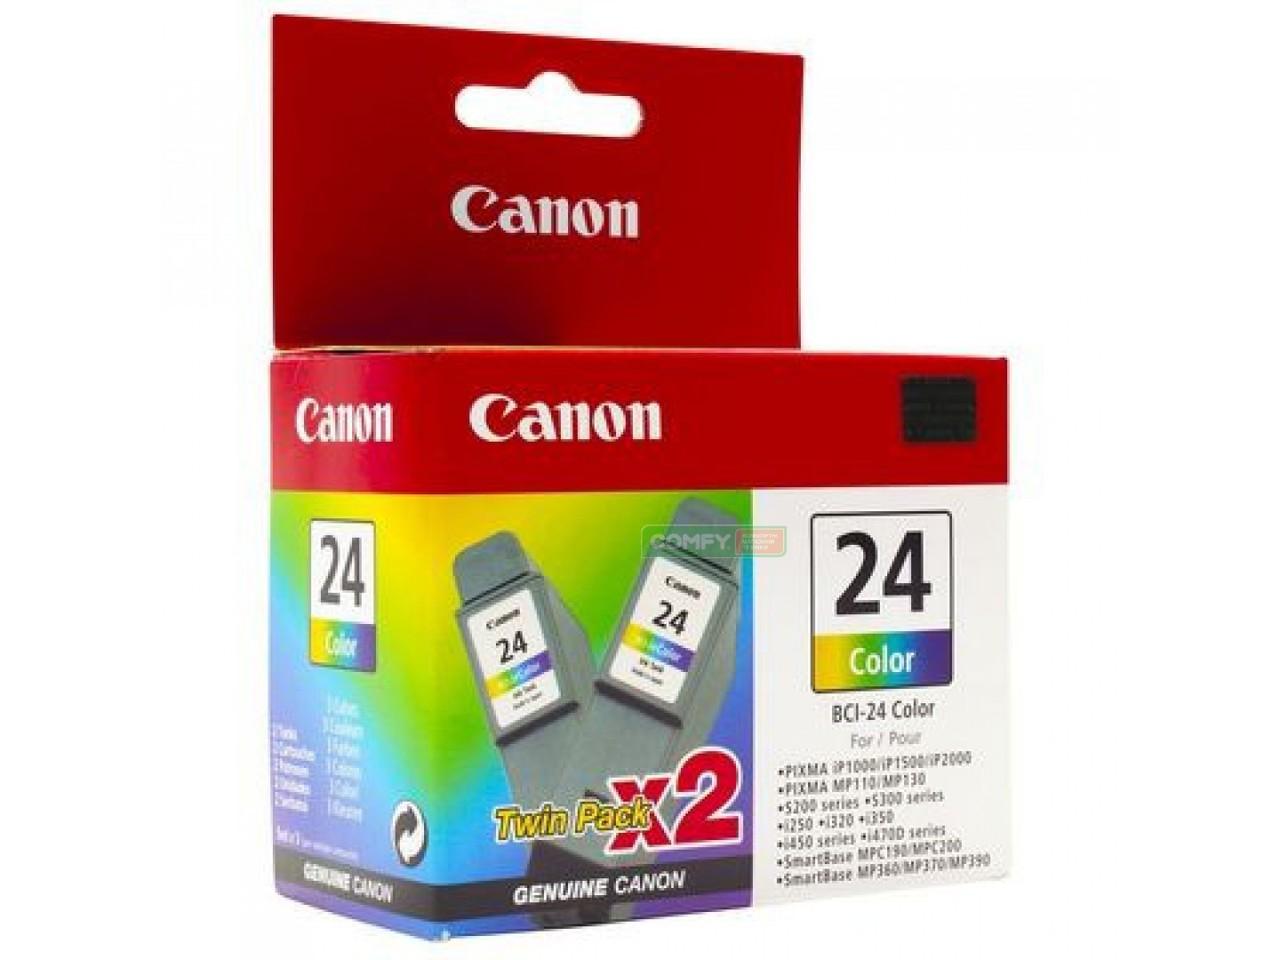 6882A010AB | Canon BCI-24 | Original Canon Ink Cartridge Twin Pack – Tri-Color